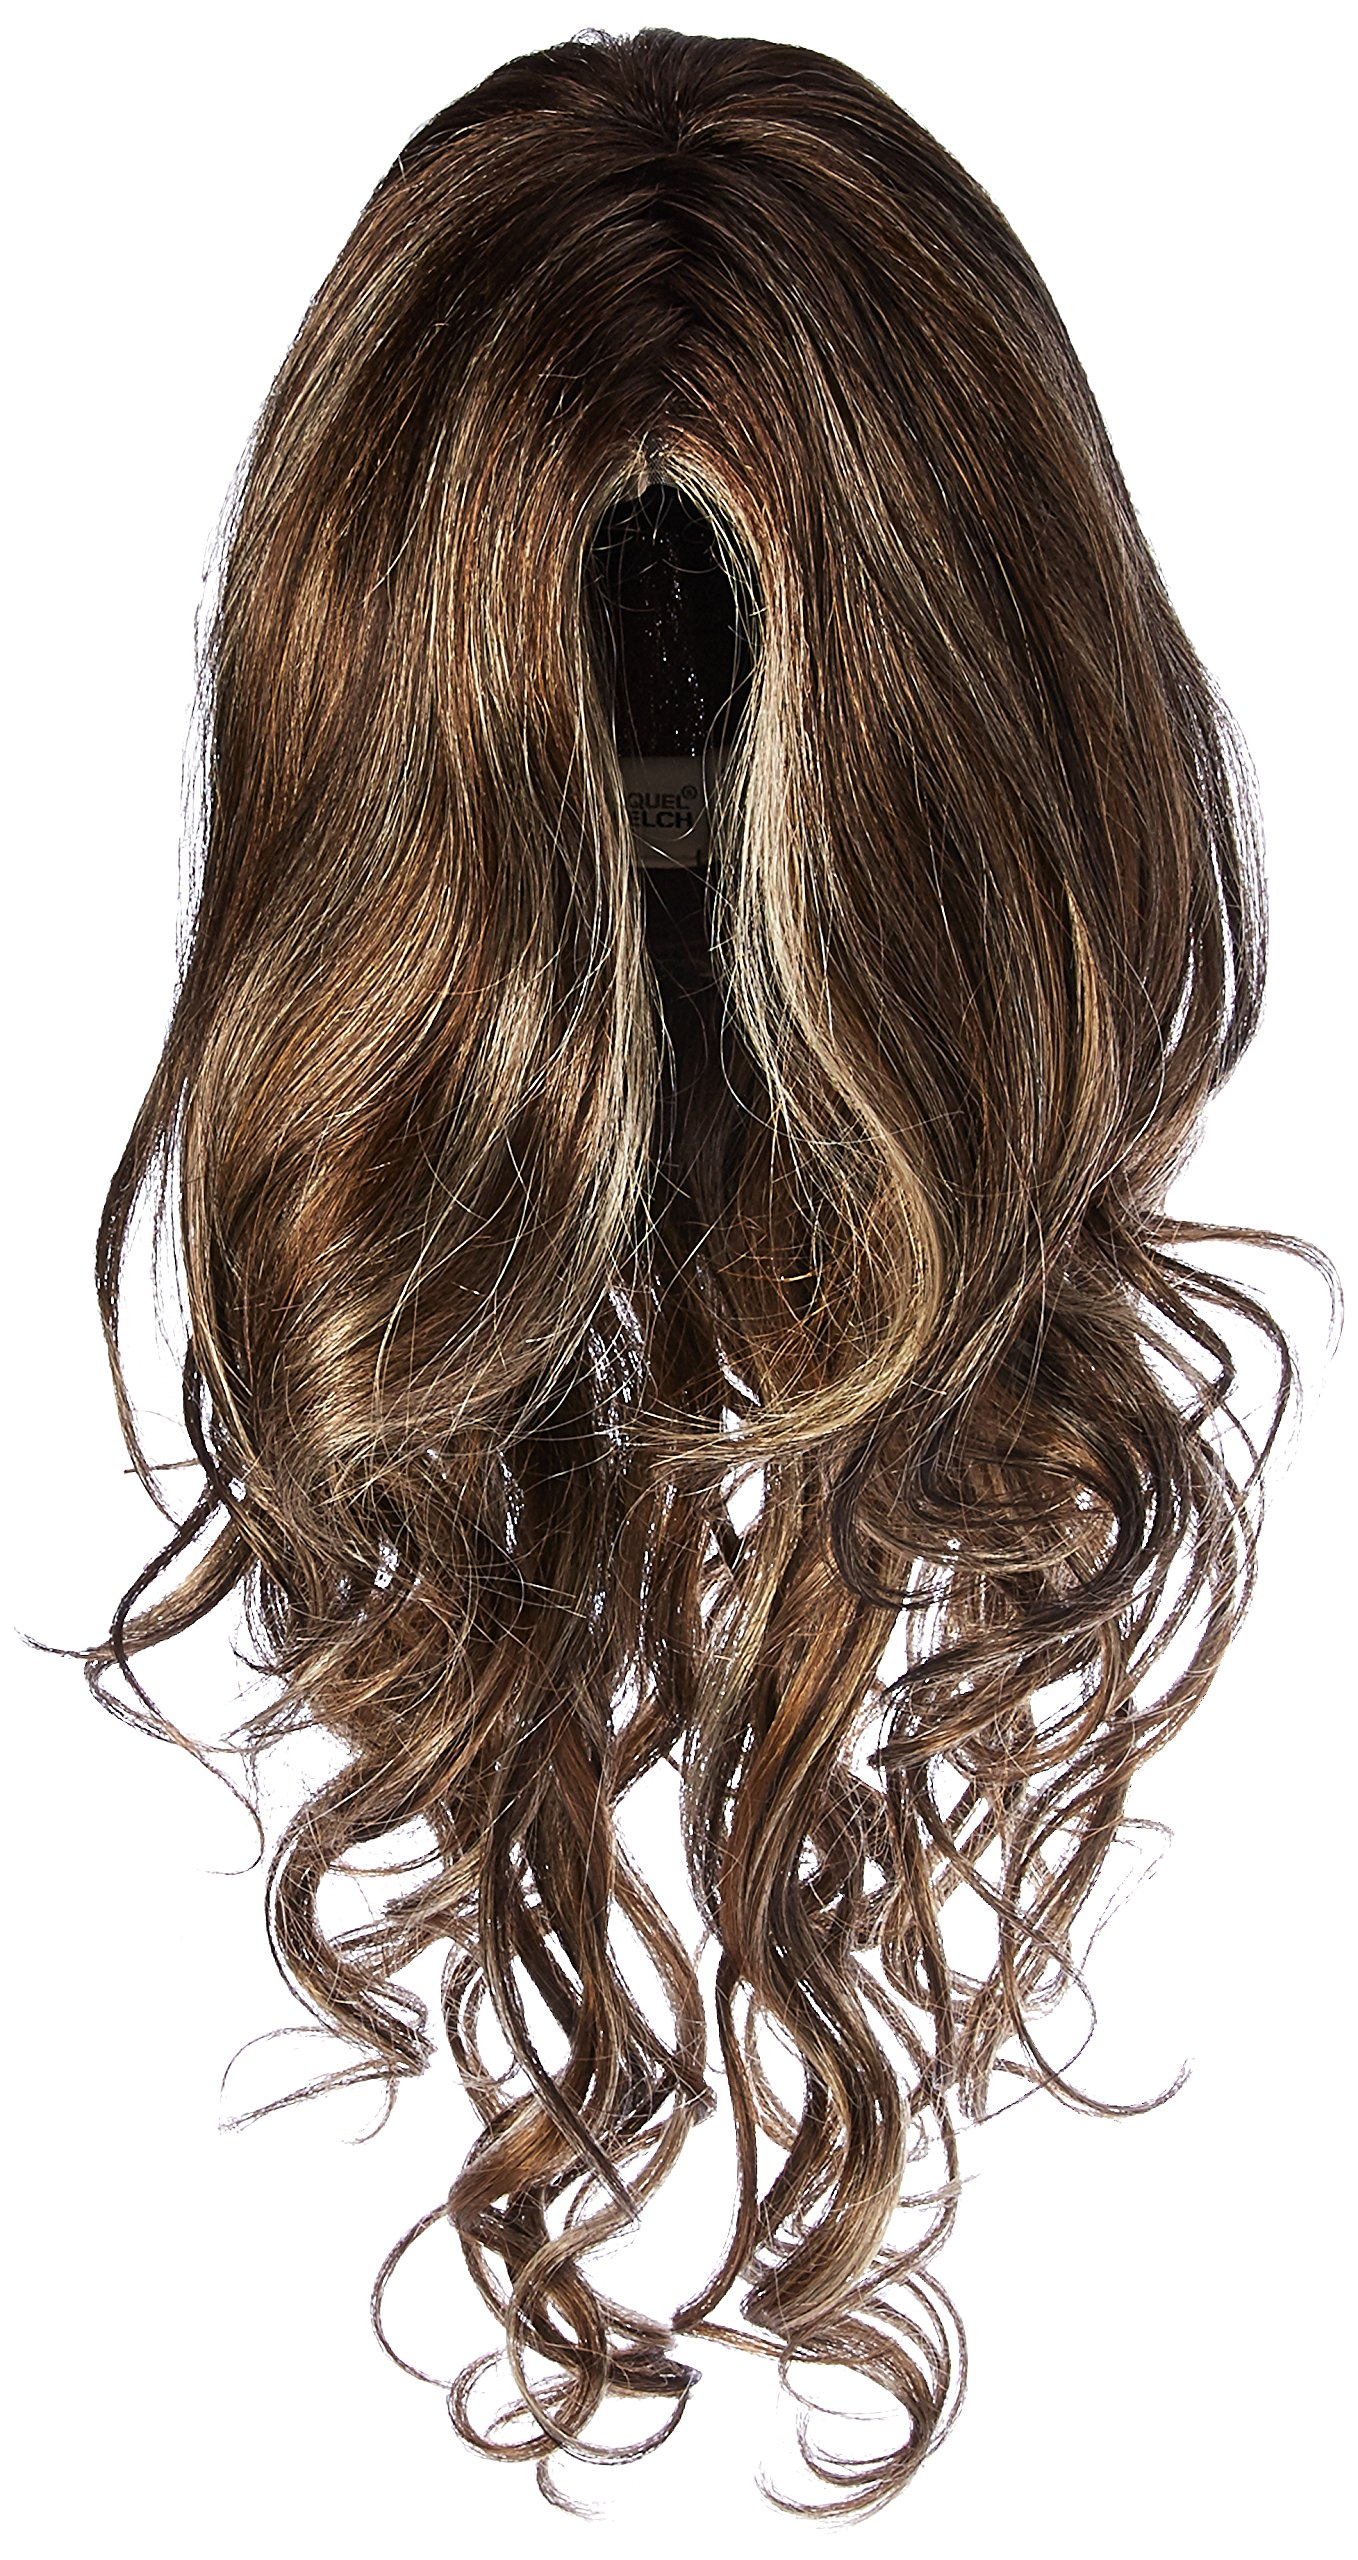 Raquel Welch Haiear Downtime Long And Luscious Hair Wig, ss10/16 ss Caramel by Hairuwear by Hair u wear